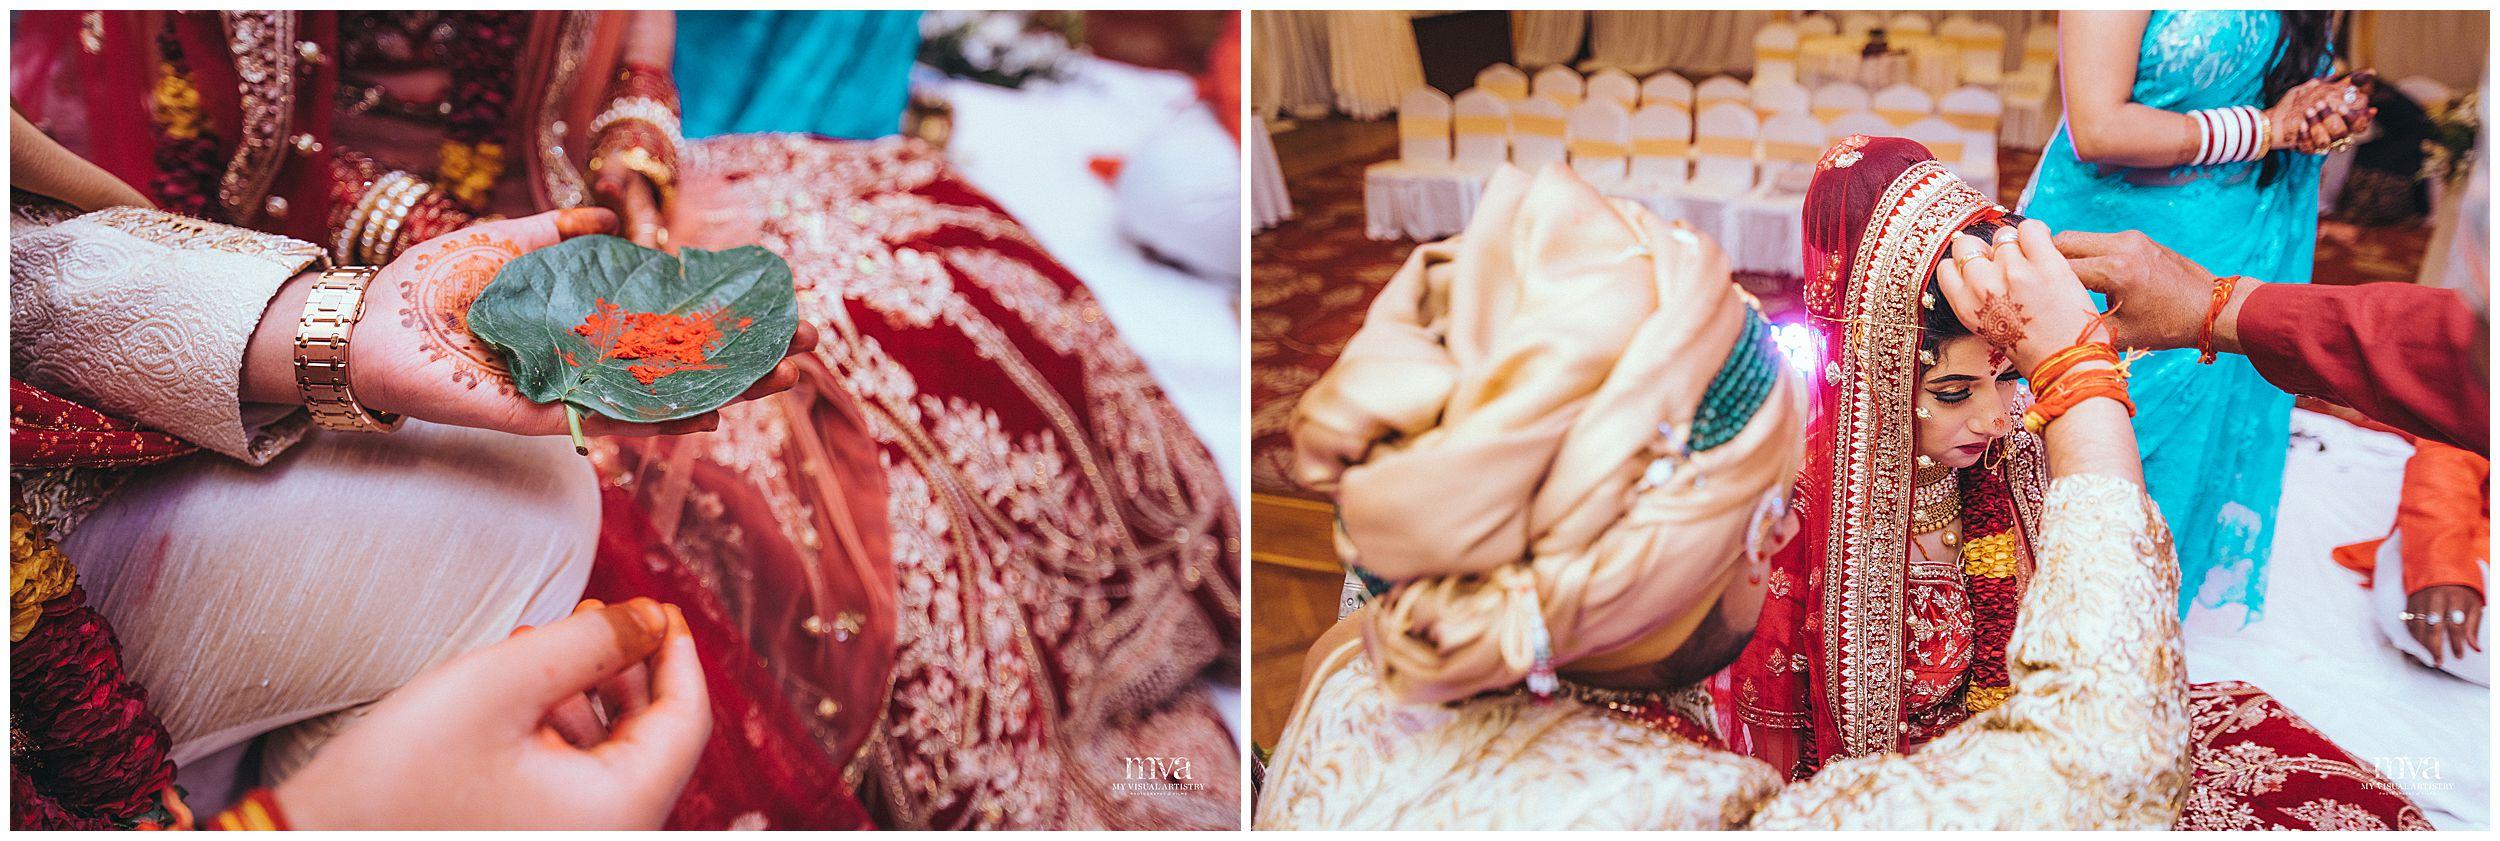 SONAAL_AMI_MYVISUALARTISTRY_WEDDING_PHOTOGRAPHY_MVA_NEPAL_KATHMANDU_SOALTEE66.jpg